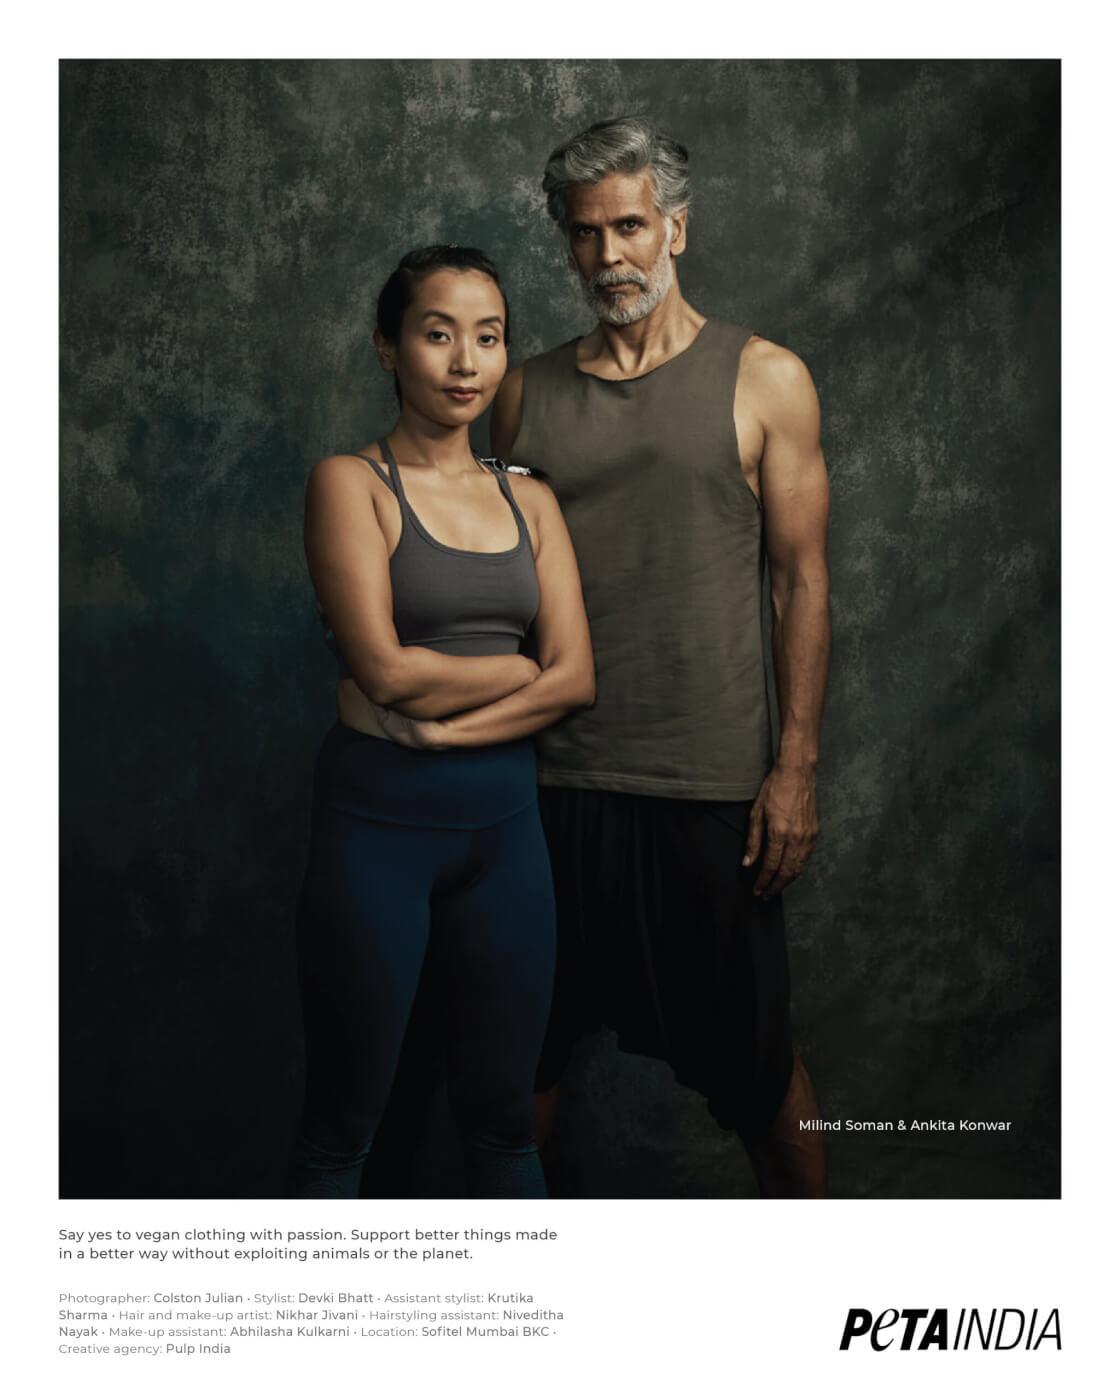 Milind Soman and Ankita Konwar Vegan Fashion Look book 2021